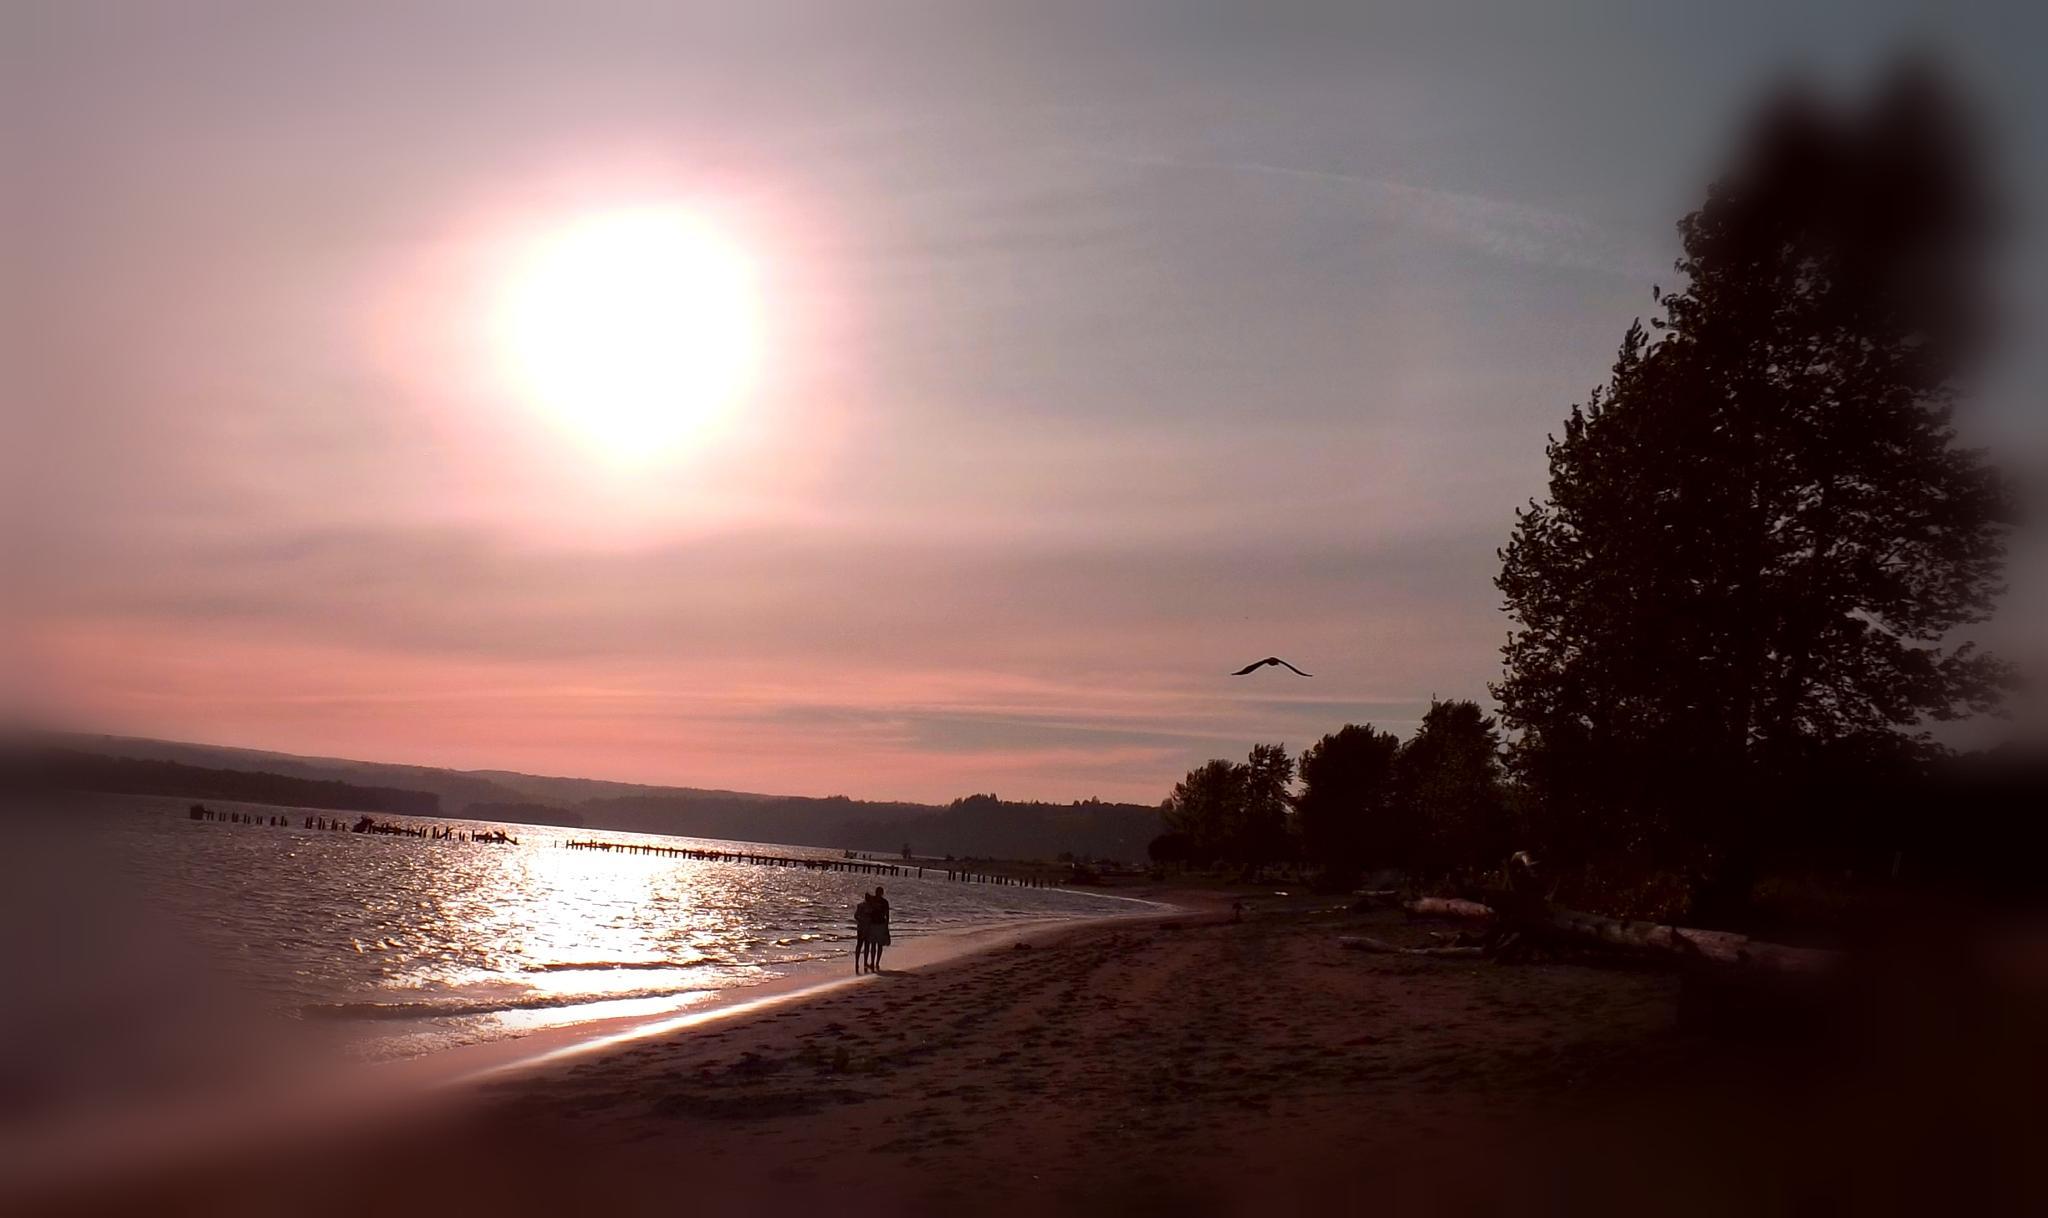 Early evening stroll by VernaSueForsgren